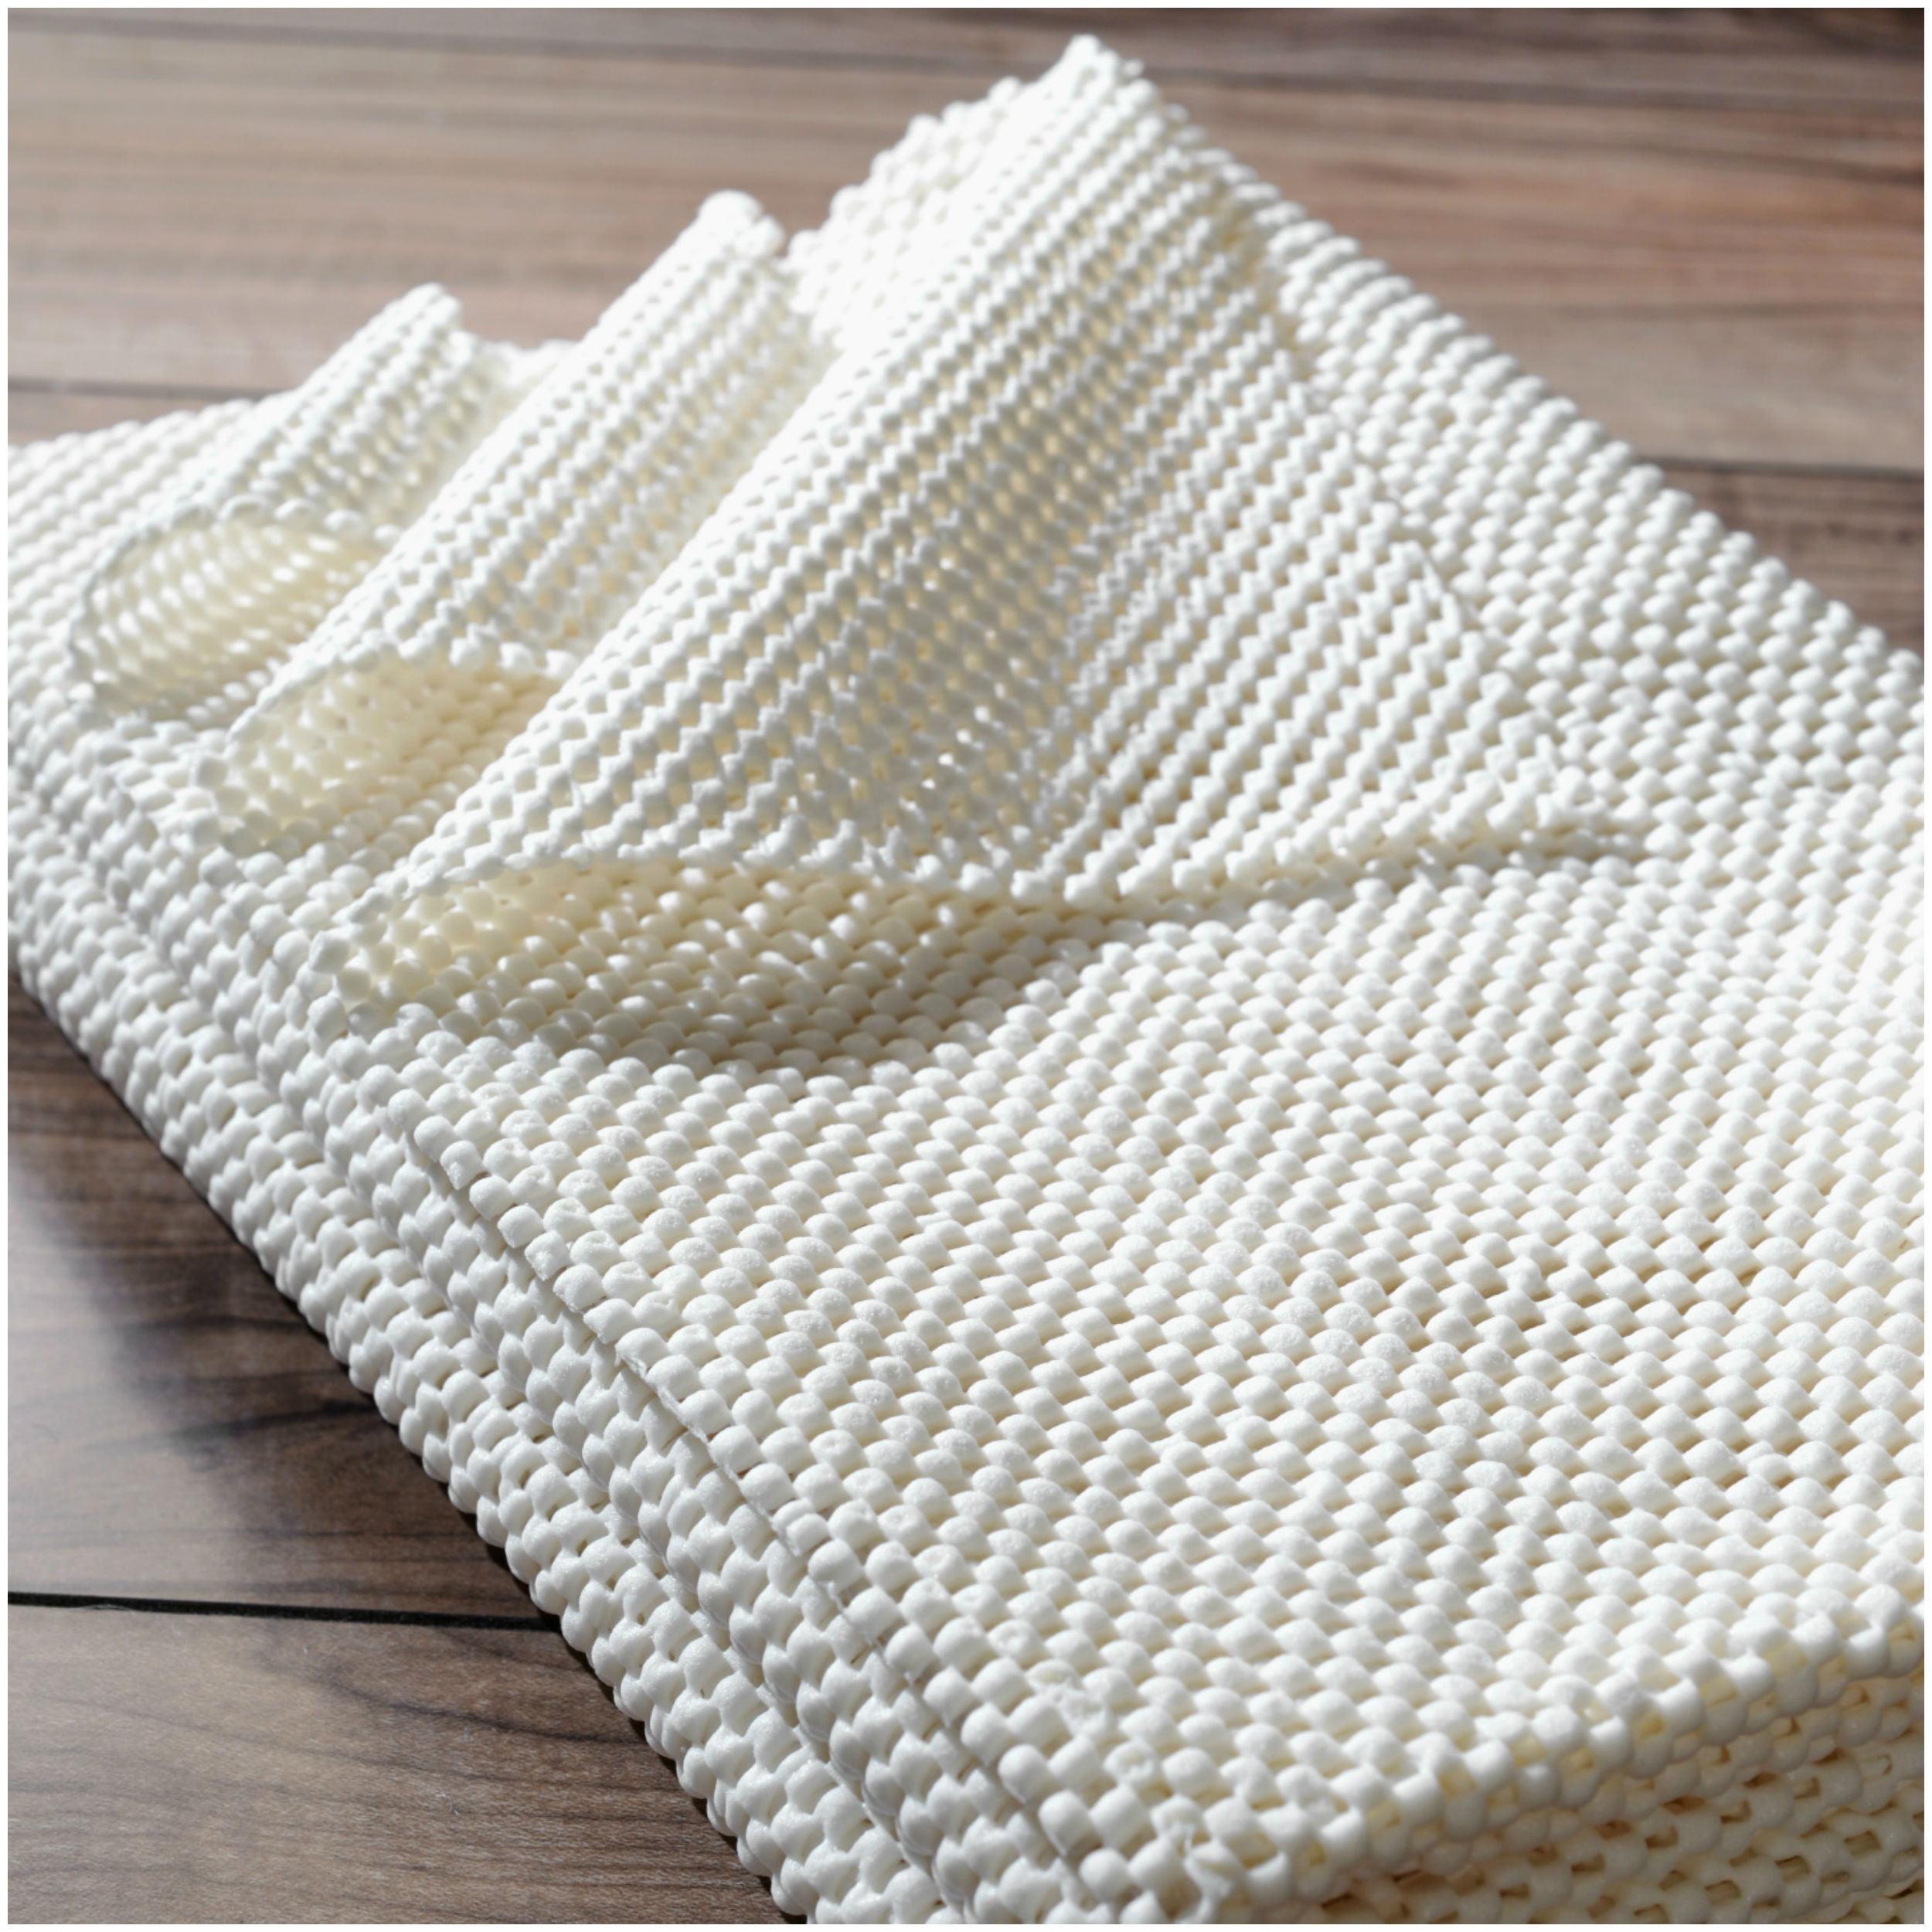 nuloom plush non-slip rug pad (8' x 10') - walmart